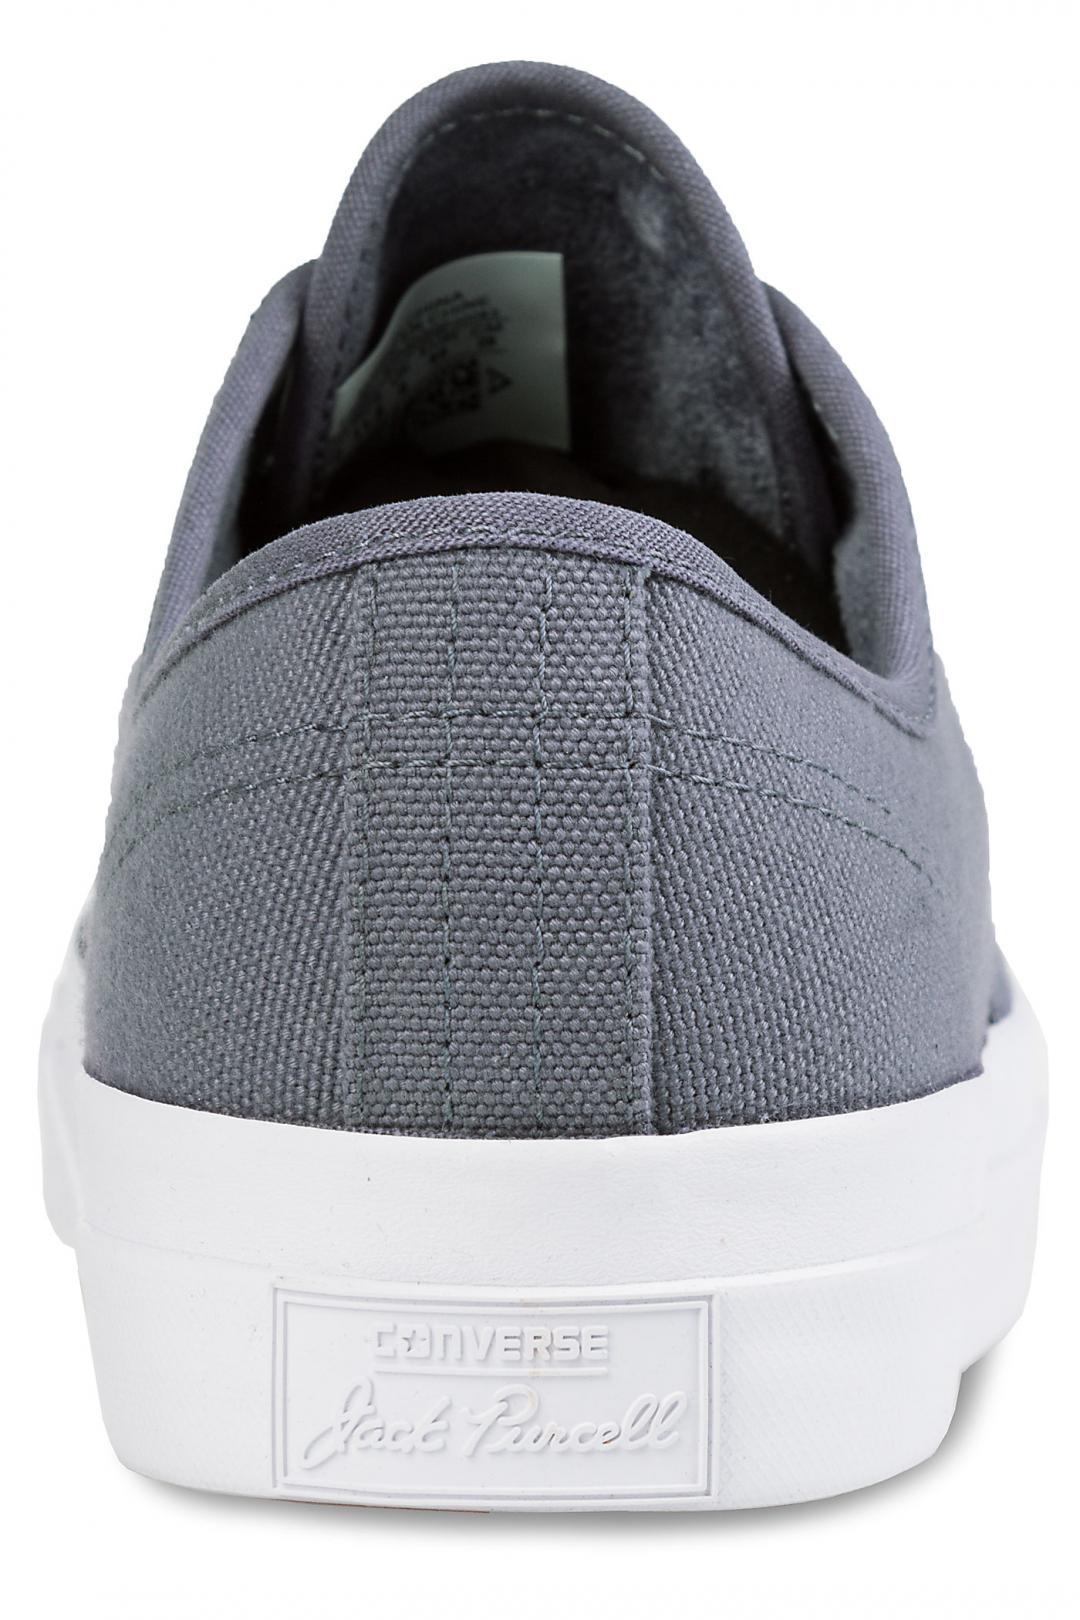 Uomo Converse Jack Purcell Pro Ox light carbon light lavender grey | Sneaker